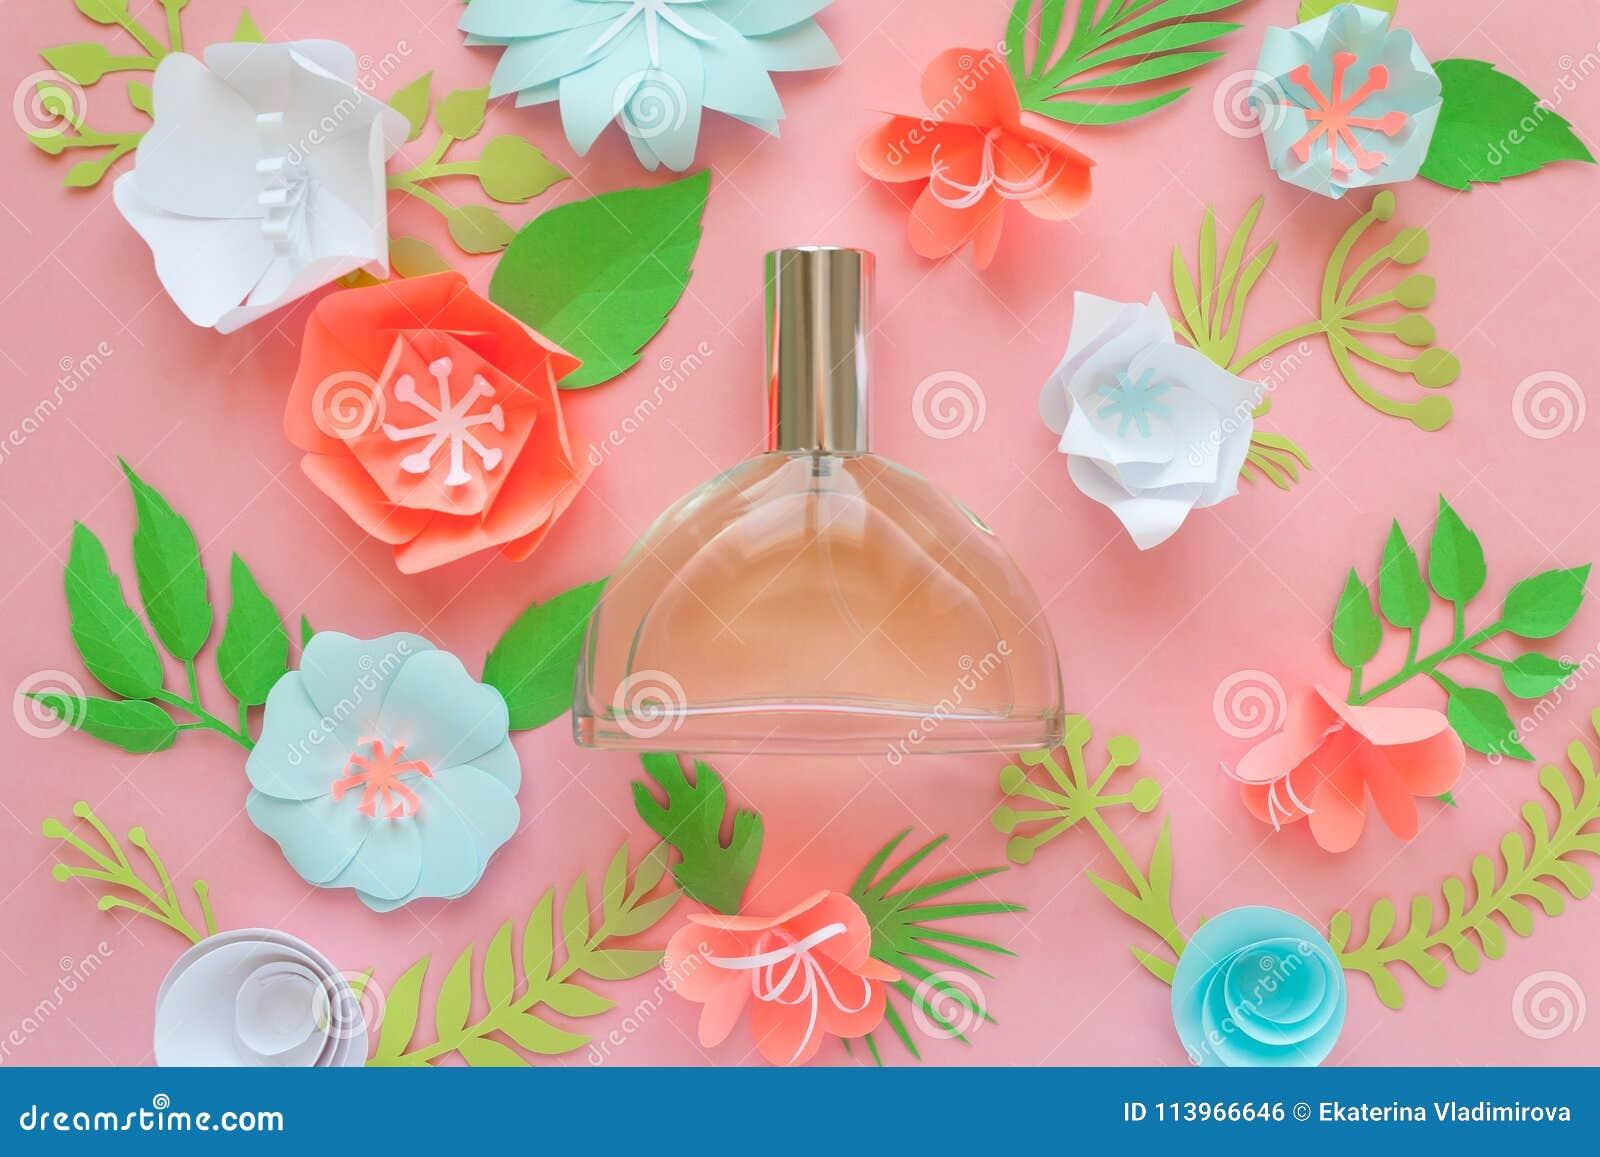 Flower Arrangement Flowers Fragrance Perfume Stock Photo Image